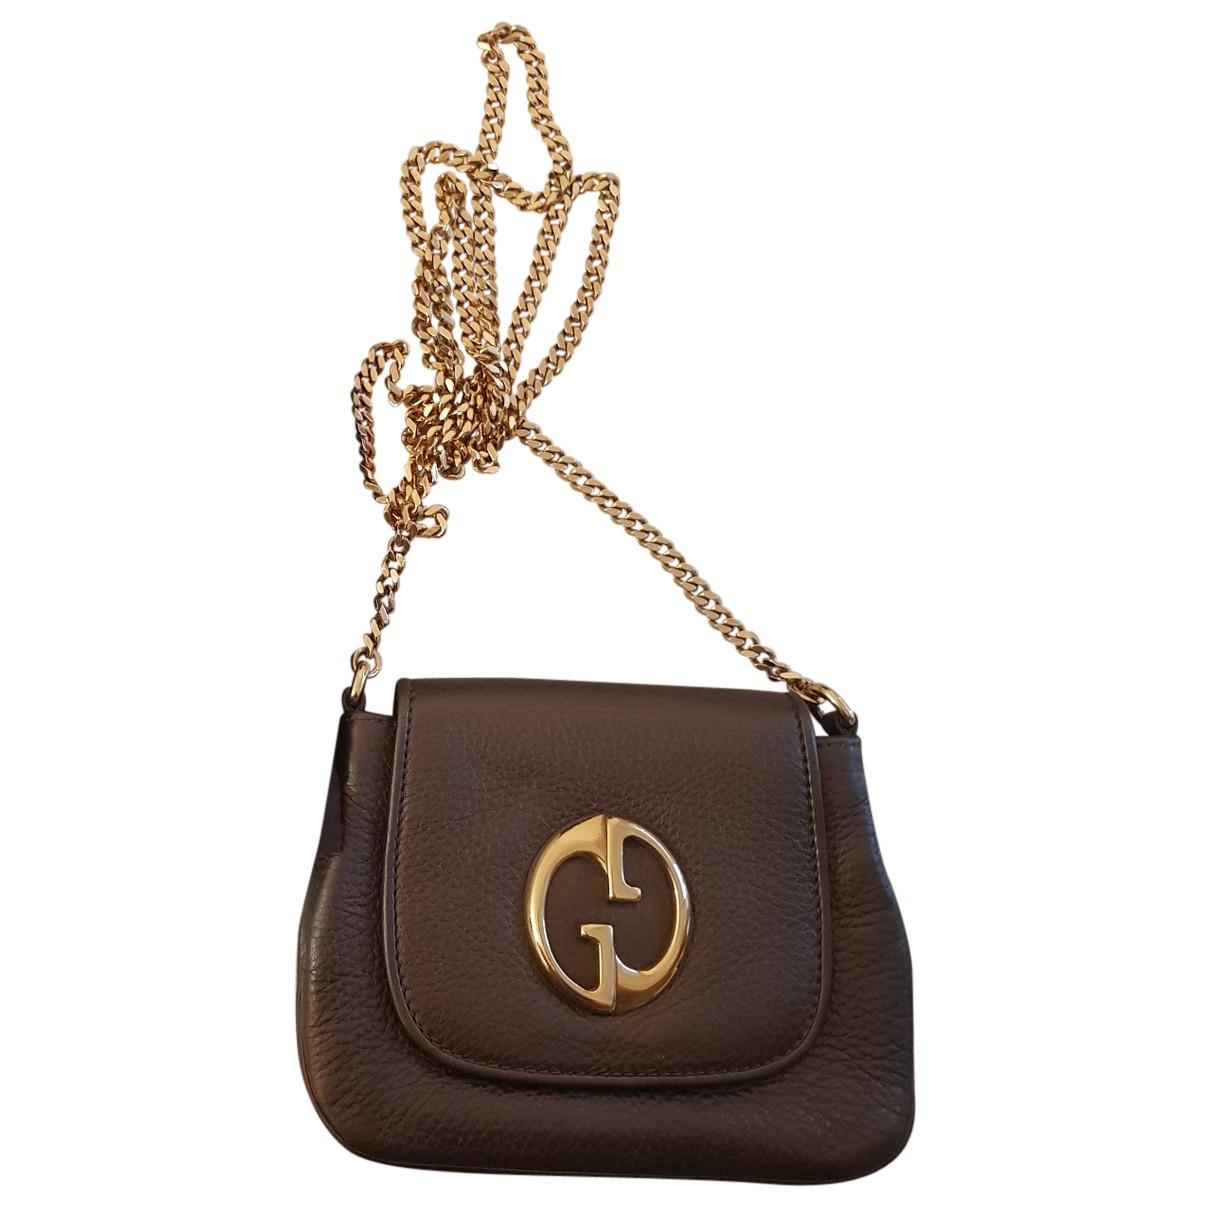 Gucci - Sac a main 1973 pour femme en cuir - marron